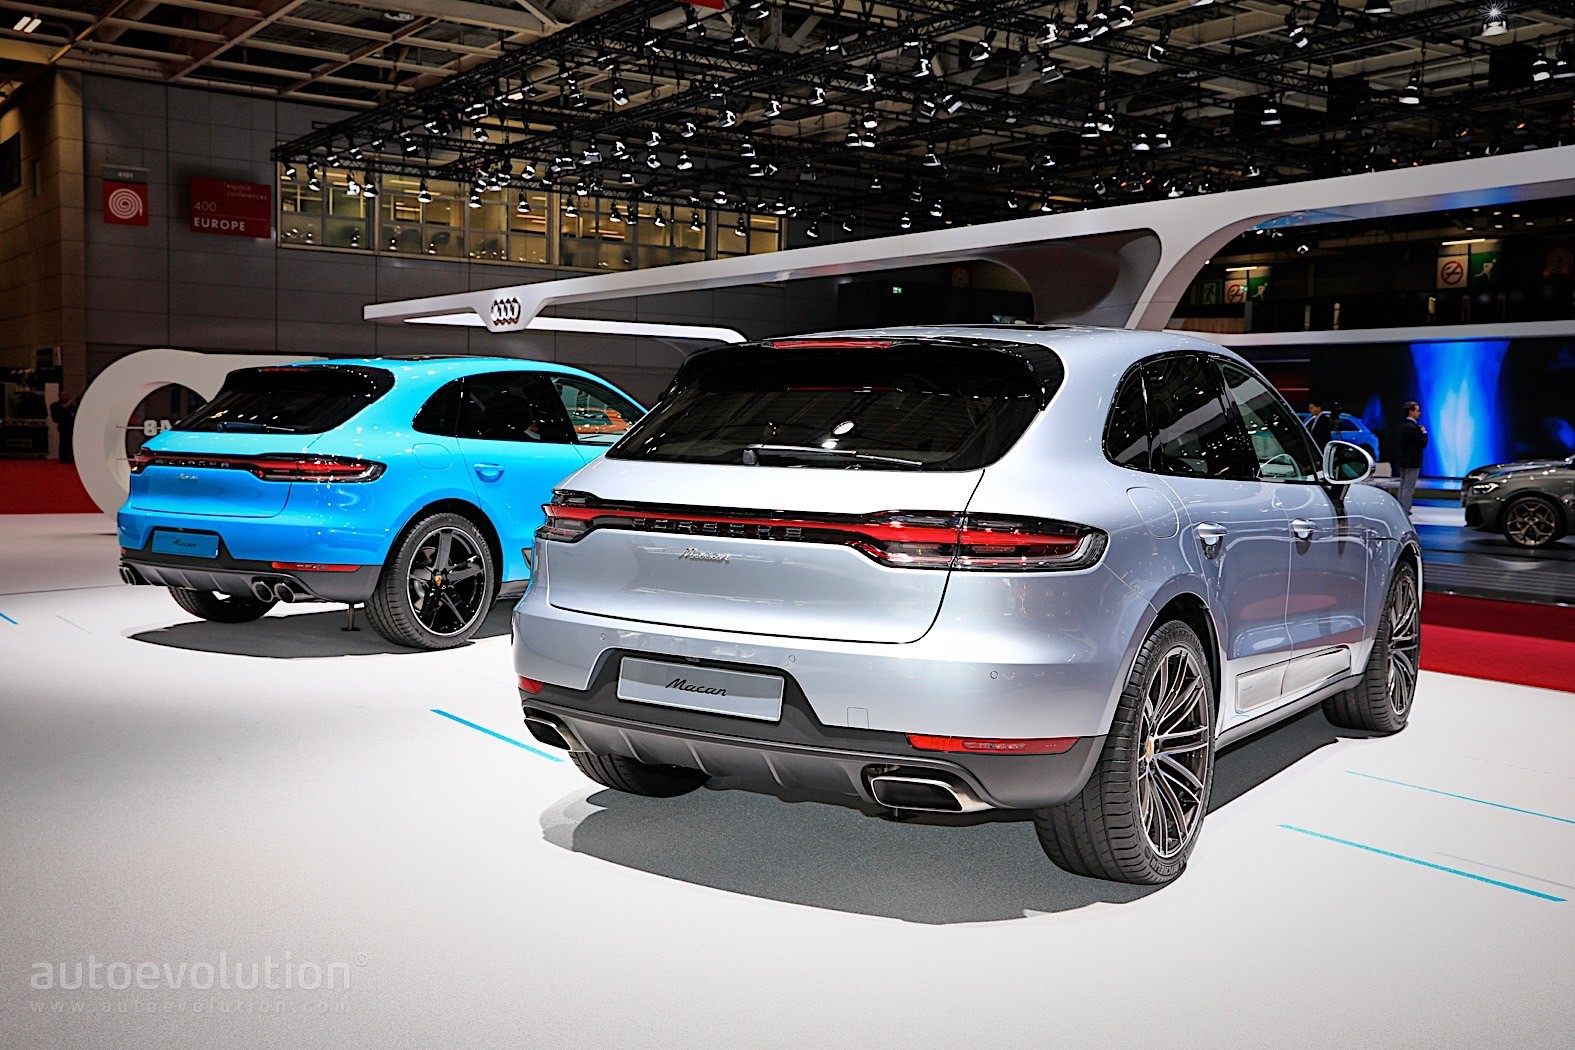 2019 Porsche Macan Facelift Lands In Paris With Bright New